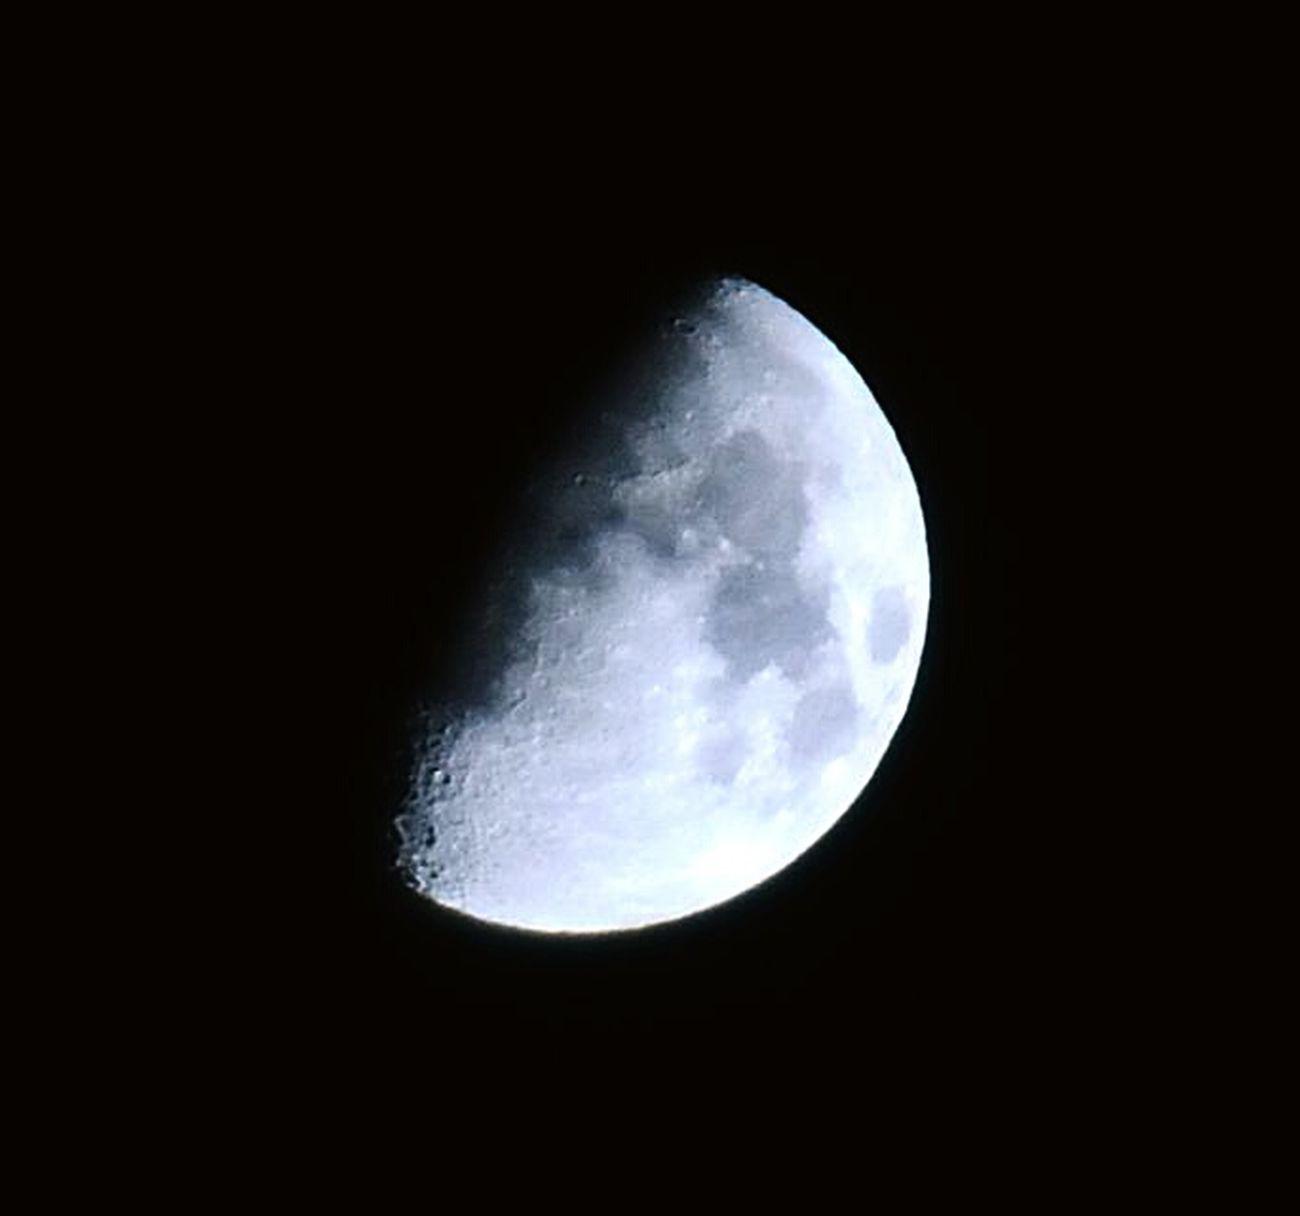 Half Moon Moon Oujda City, Morocco سبحانك ربي Beauty Nature Sky A Look At The Sky Night Photography